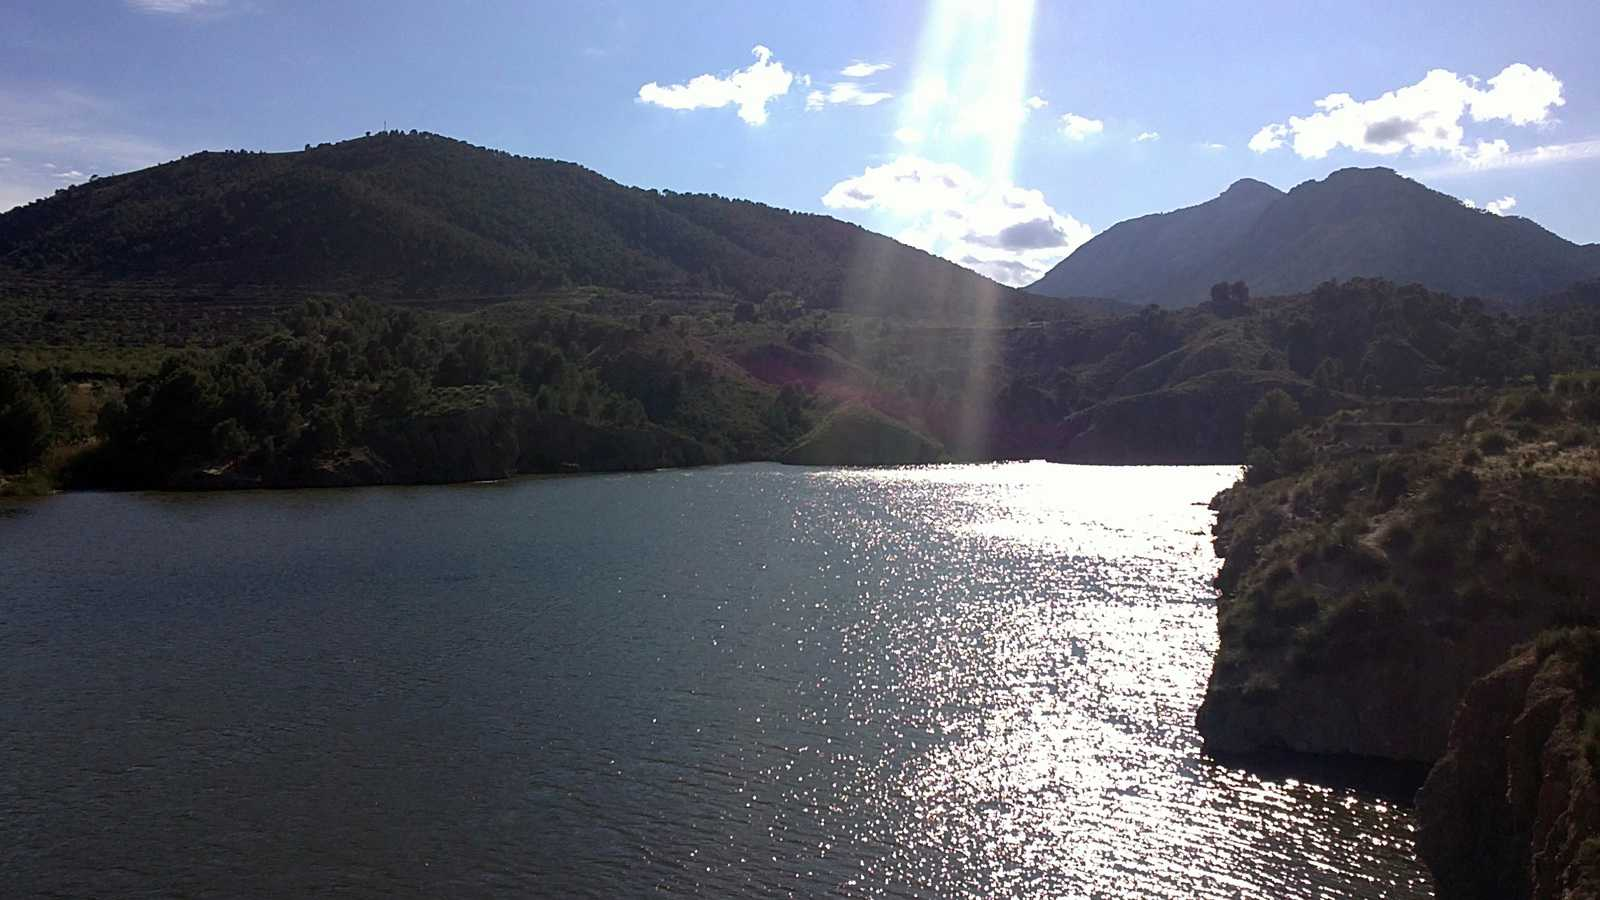 1467569303_29.- Pantano de Tibi - Mayo 2012